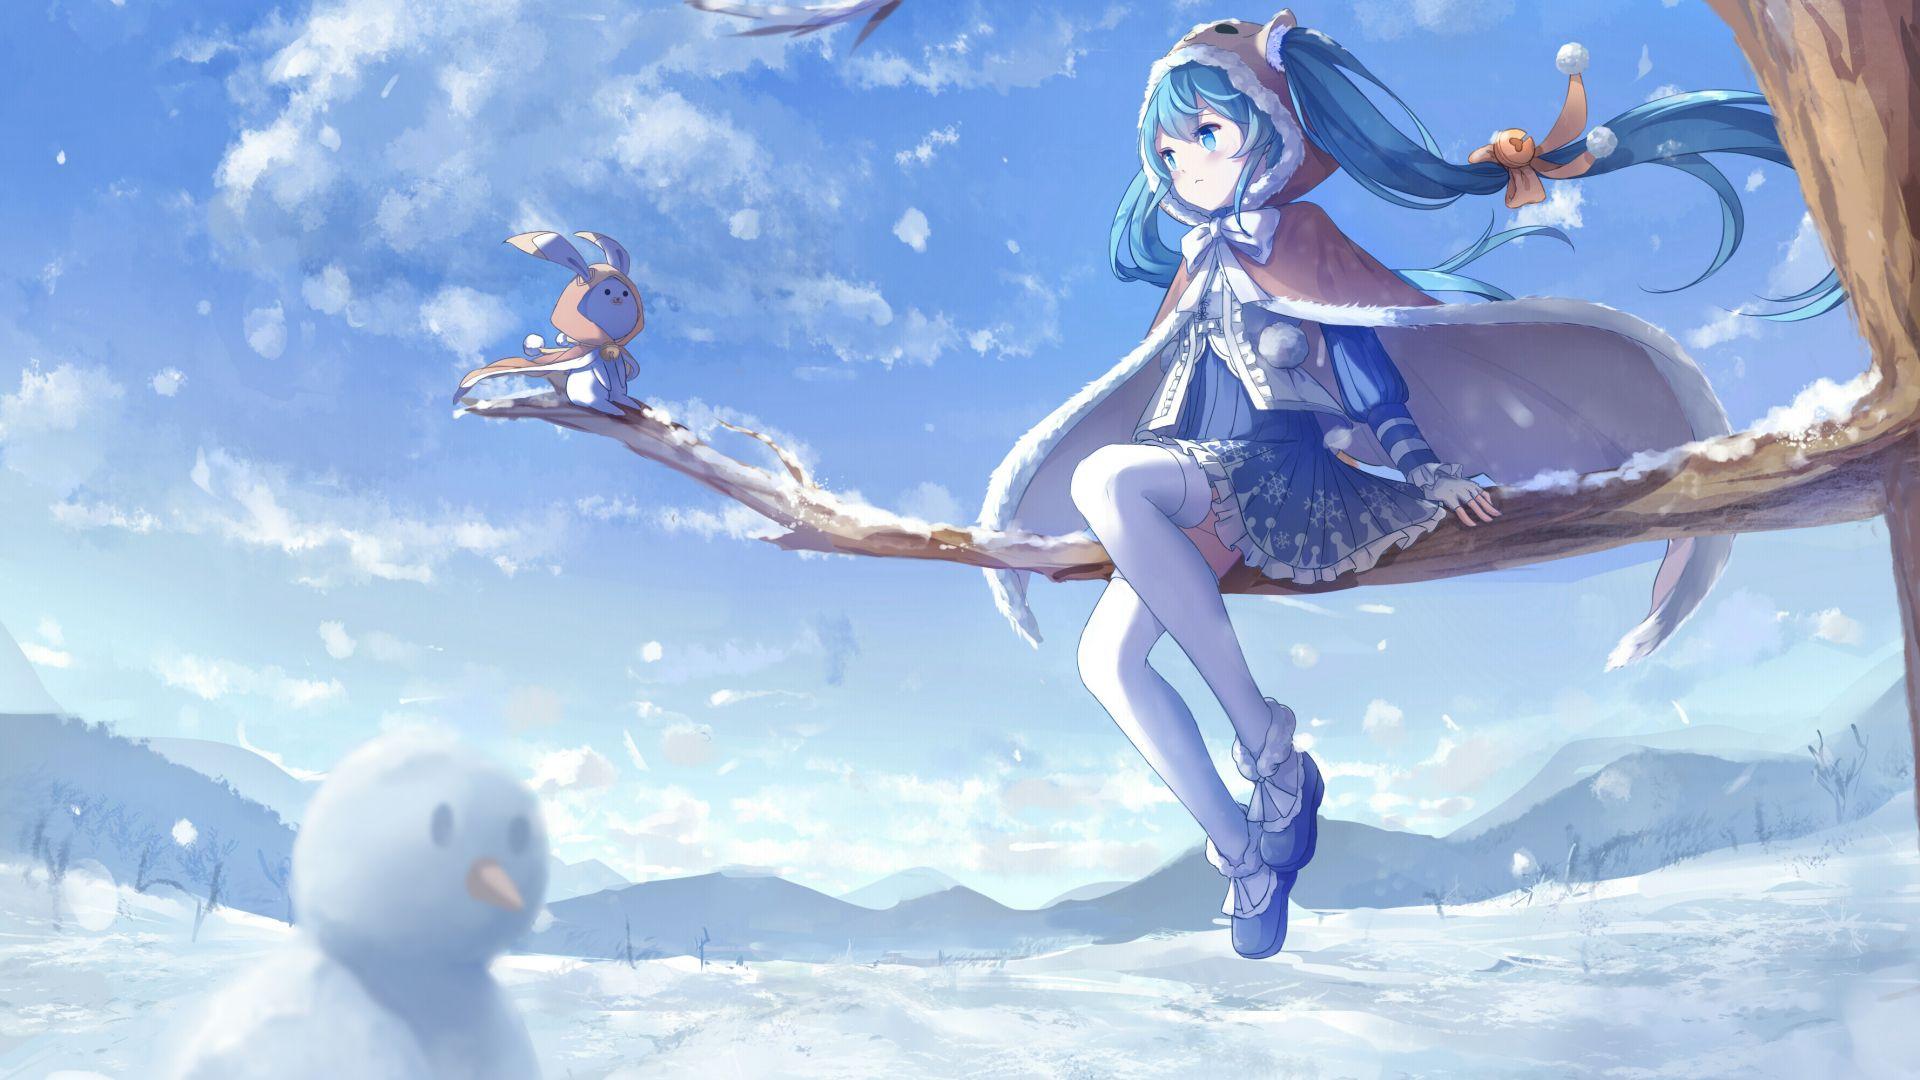 Cute Baby Girl Hd Wallpapers 1080p Desktop Wallpaper Hatsune Miku Outdoor Winter Hd Image